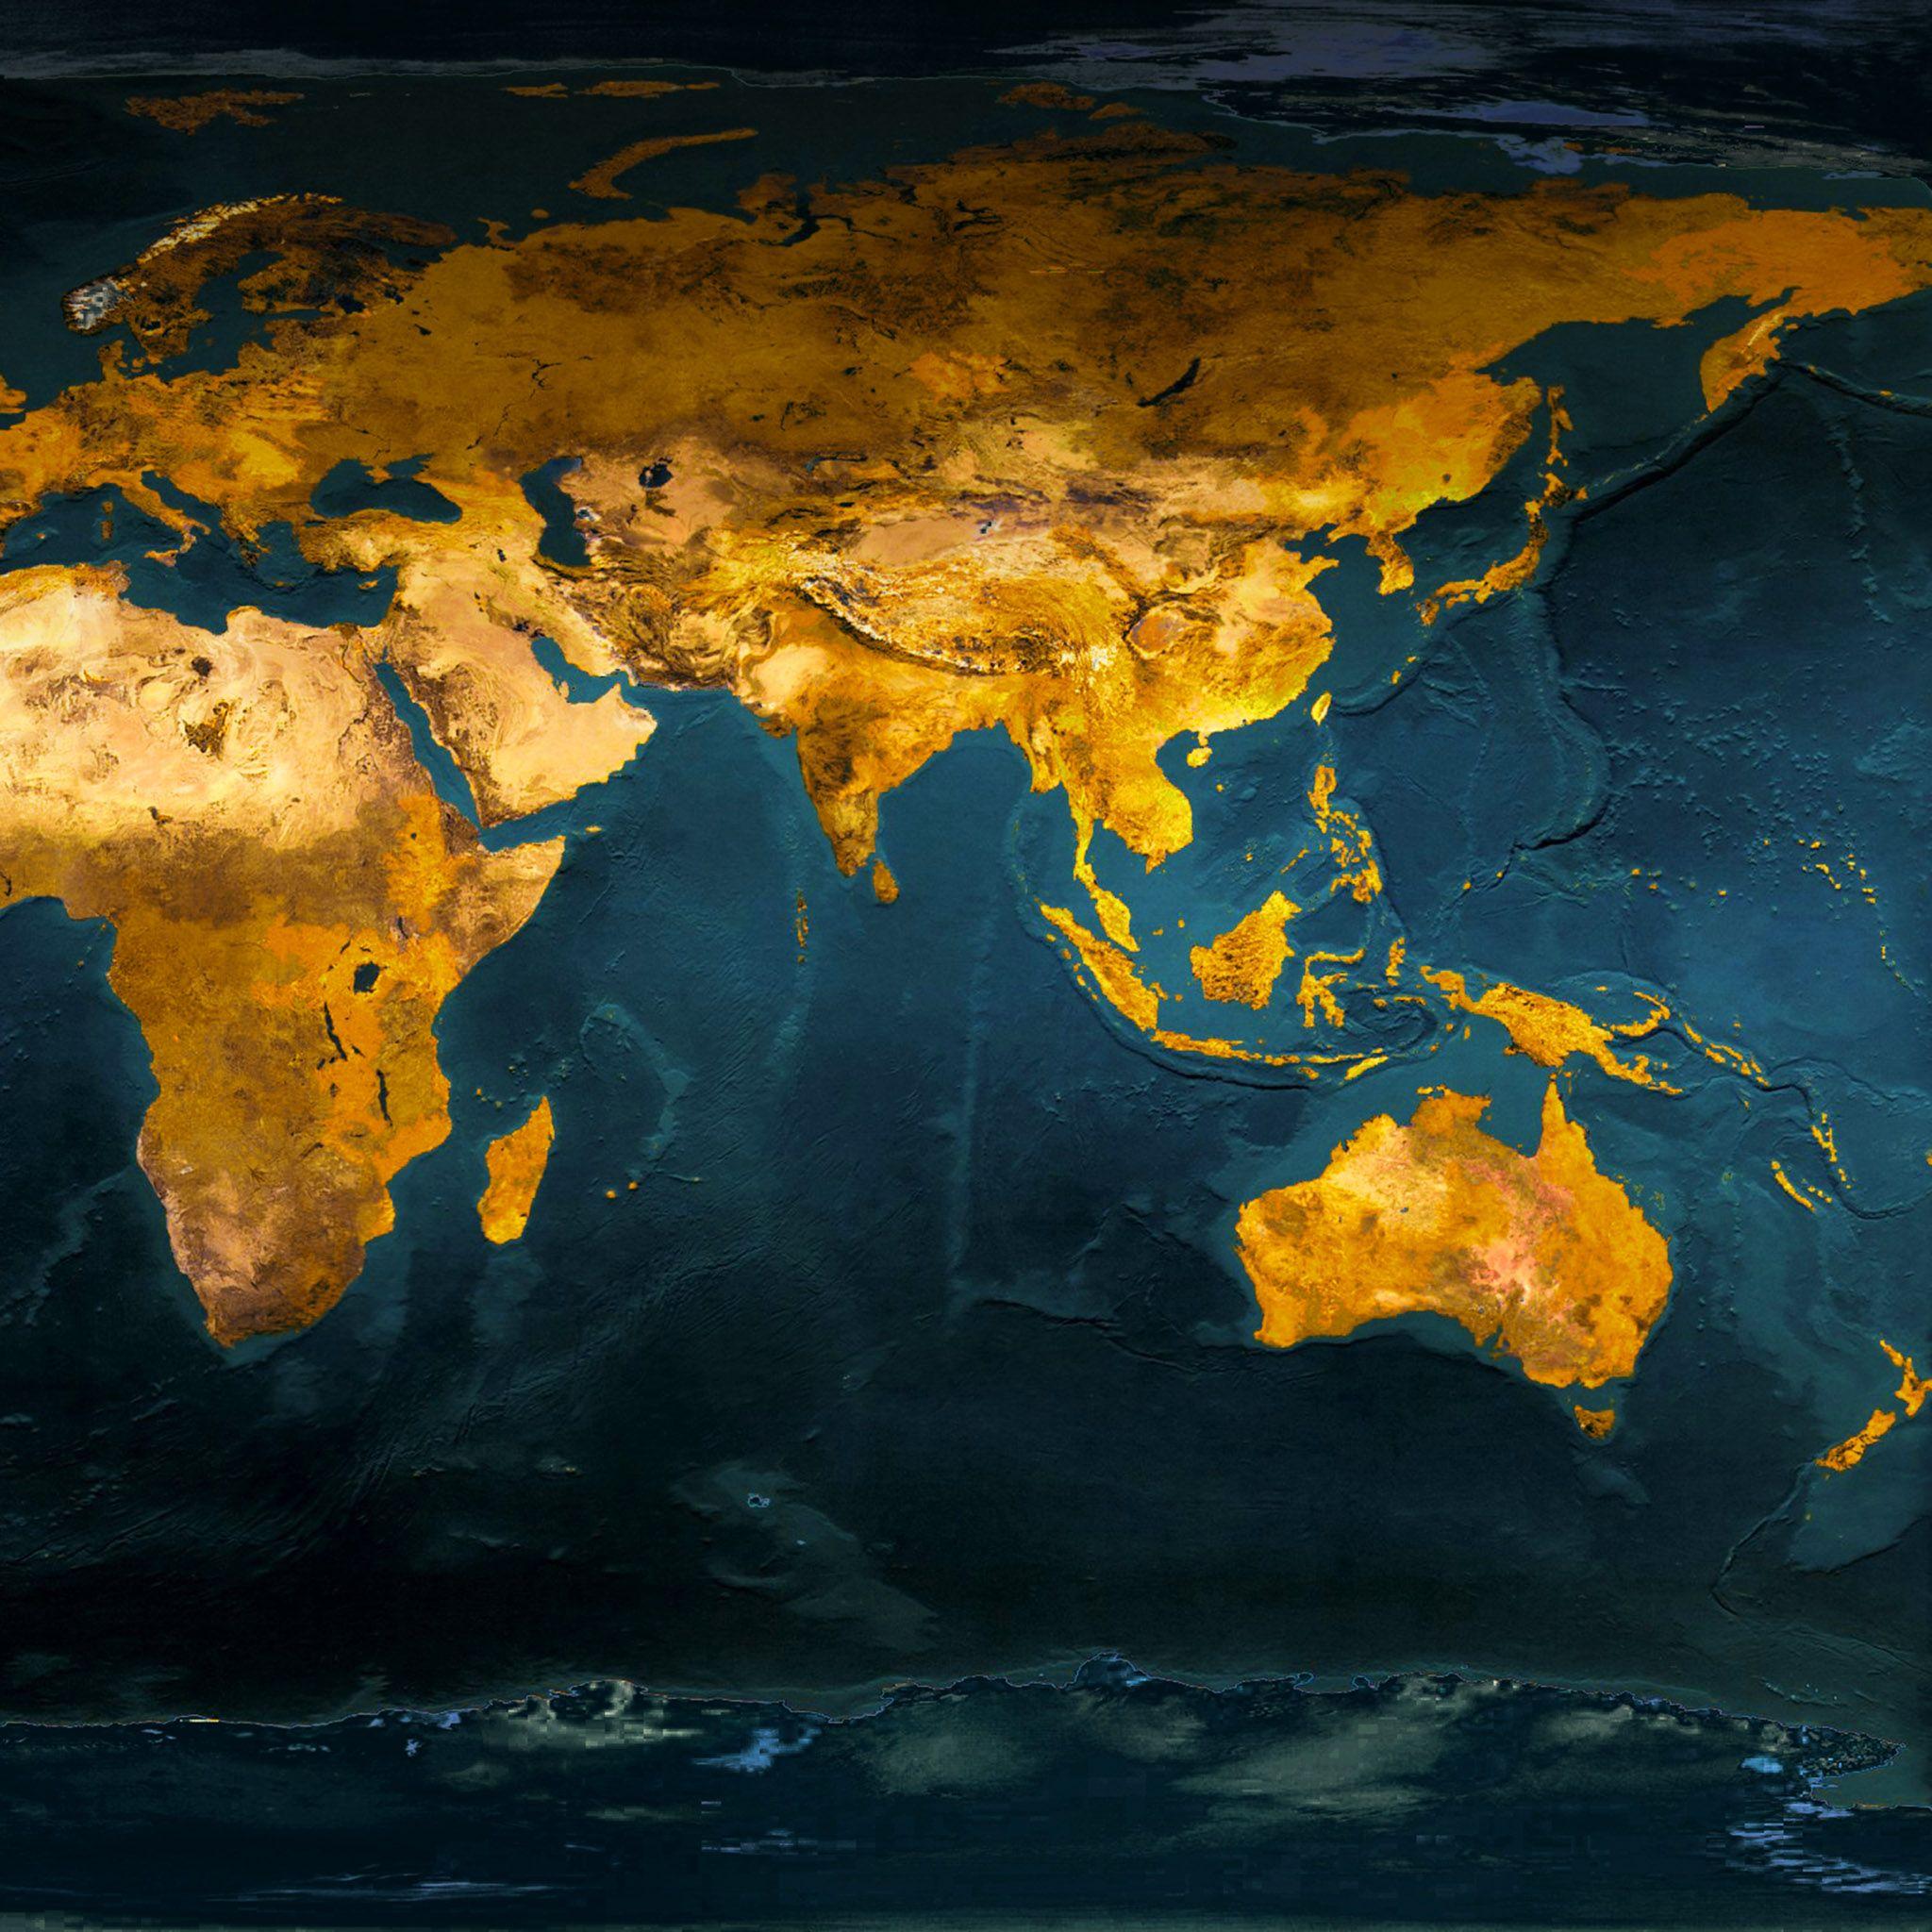 Wallpapers retina ipad air buscar con google victoriamo world map ipad air wallpaper gumiabroncs Images